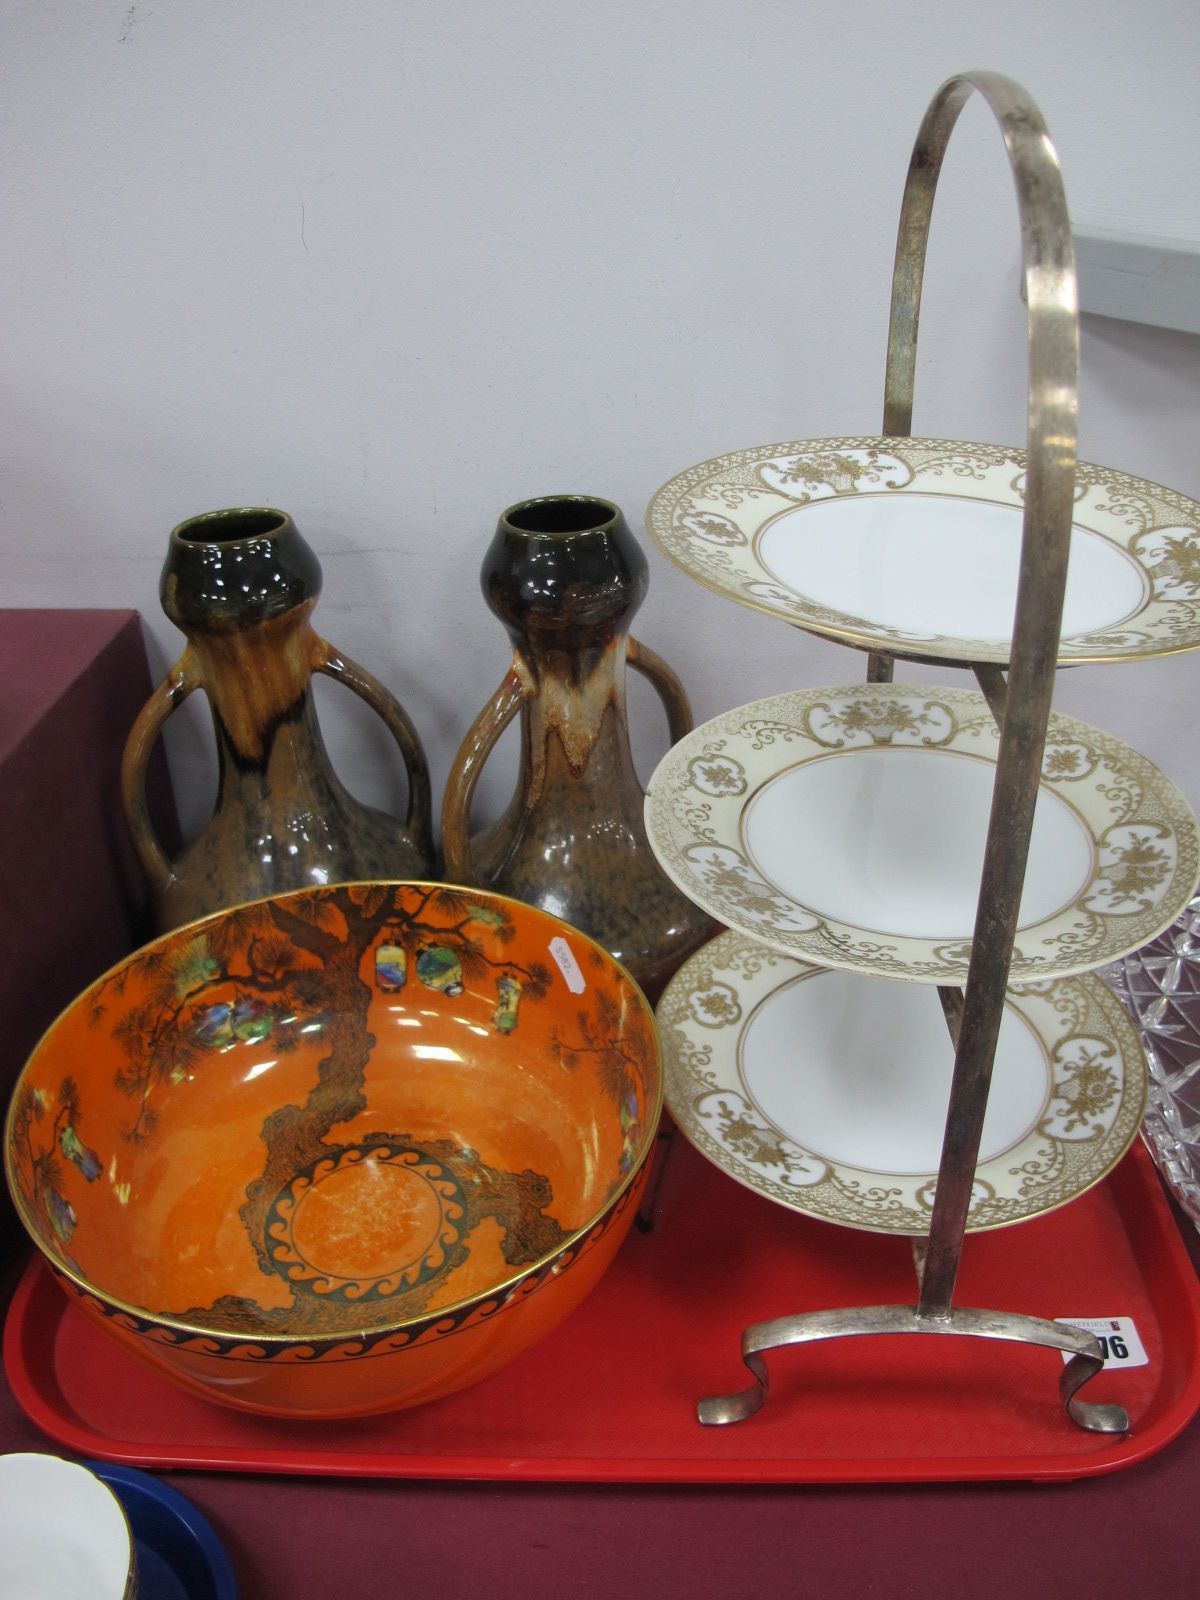 A Wilkinson Orange Lustre Fruit Bowl, with lantern decoration, Noritake three tier cake stand,